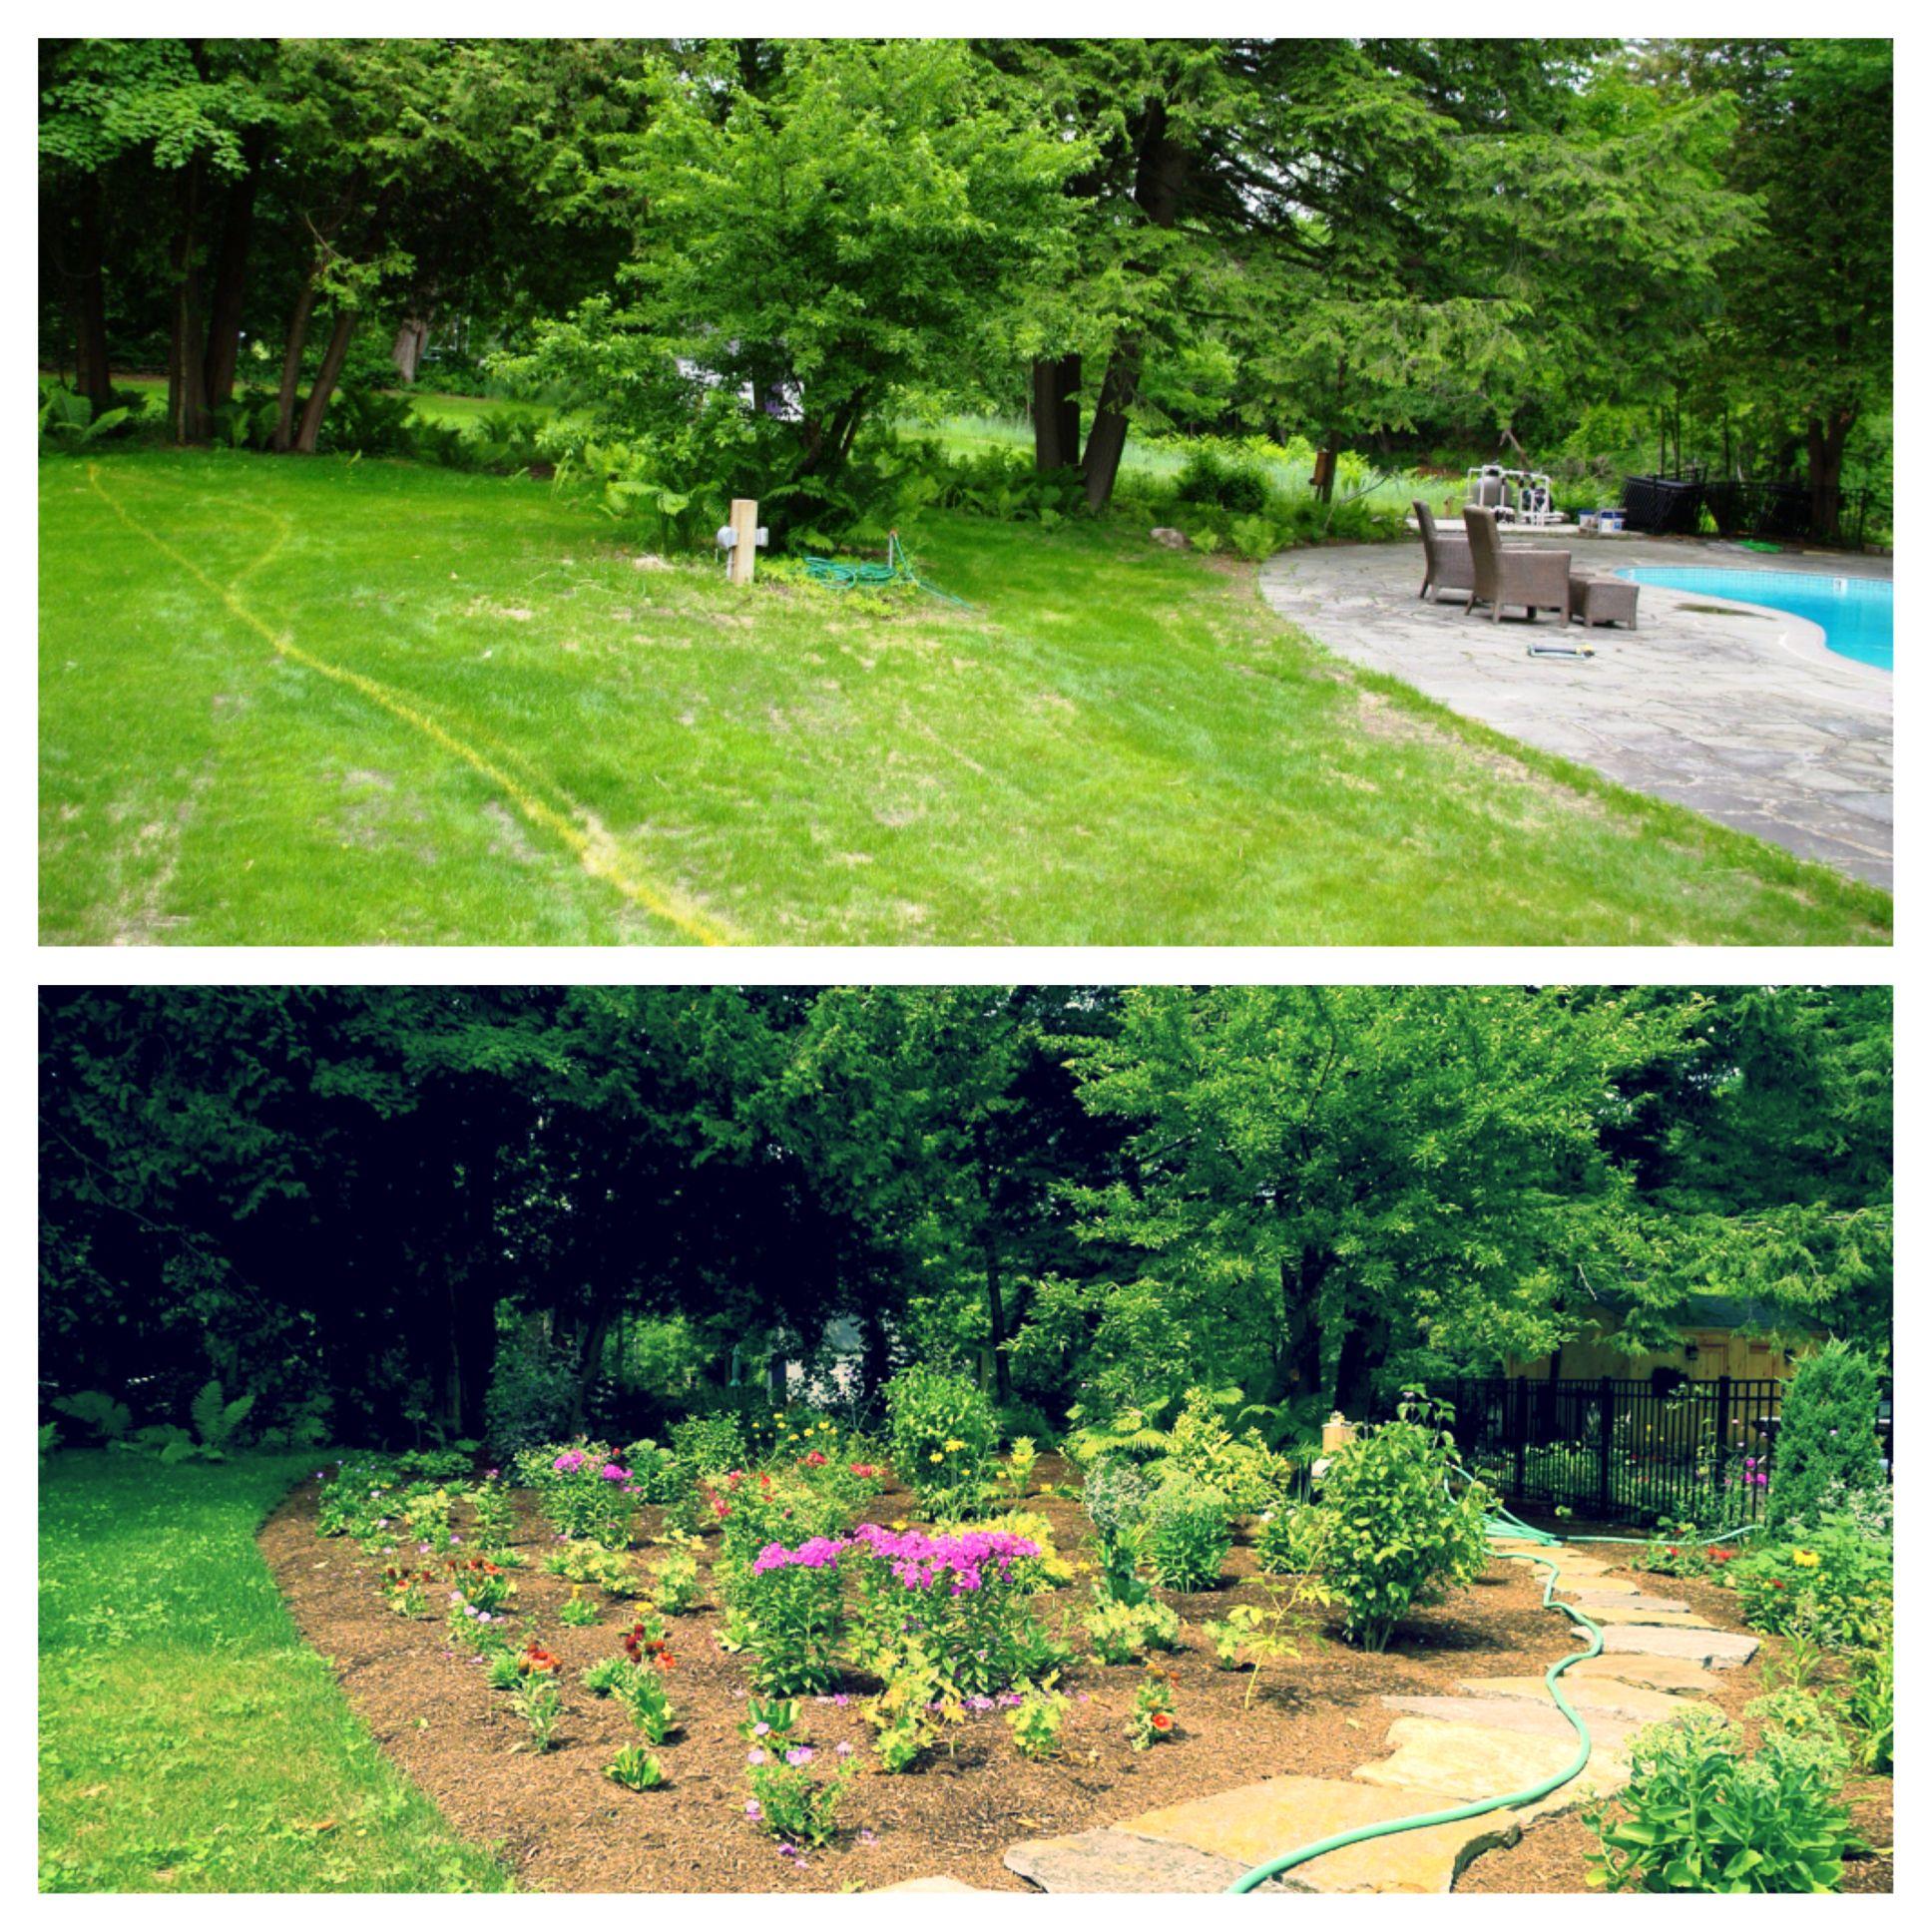 4f53c4a151cbdf76f74c191f3238e19e - Before And After Pictures Of Gardens